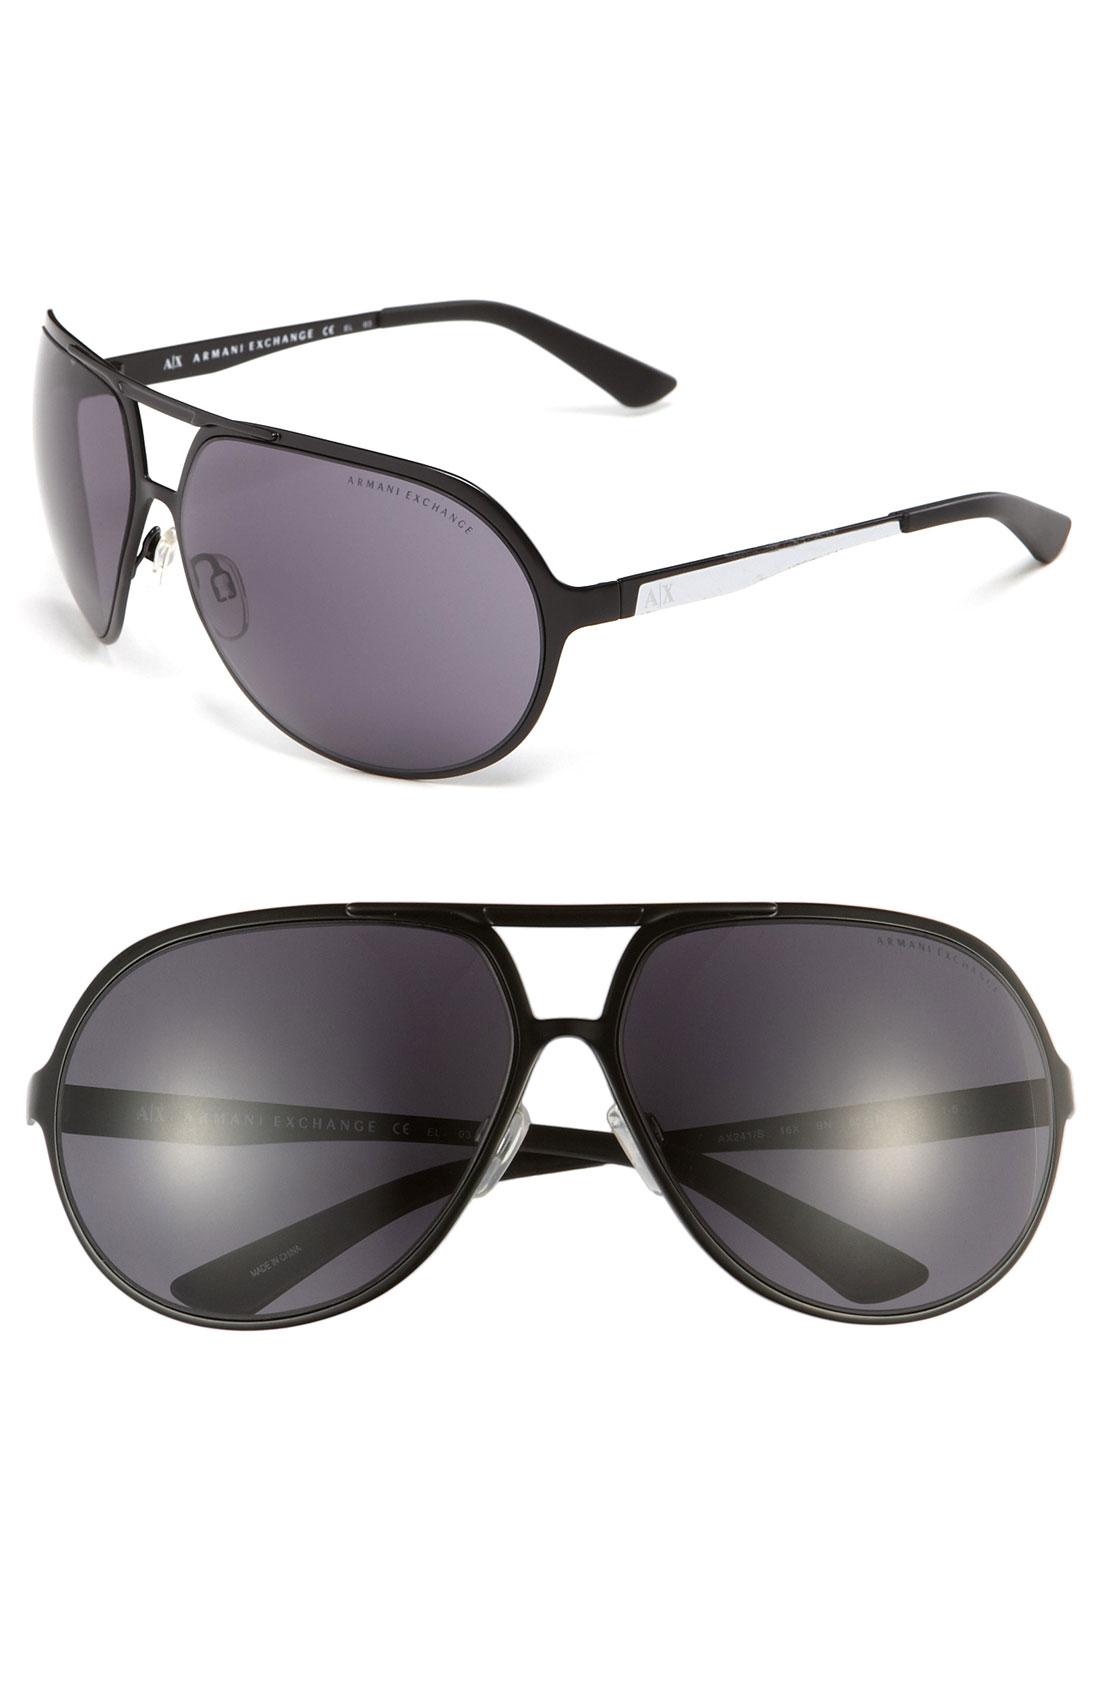 0e6ef2688a7 Ax Armani Exchange Resin Aviator Sunglasses